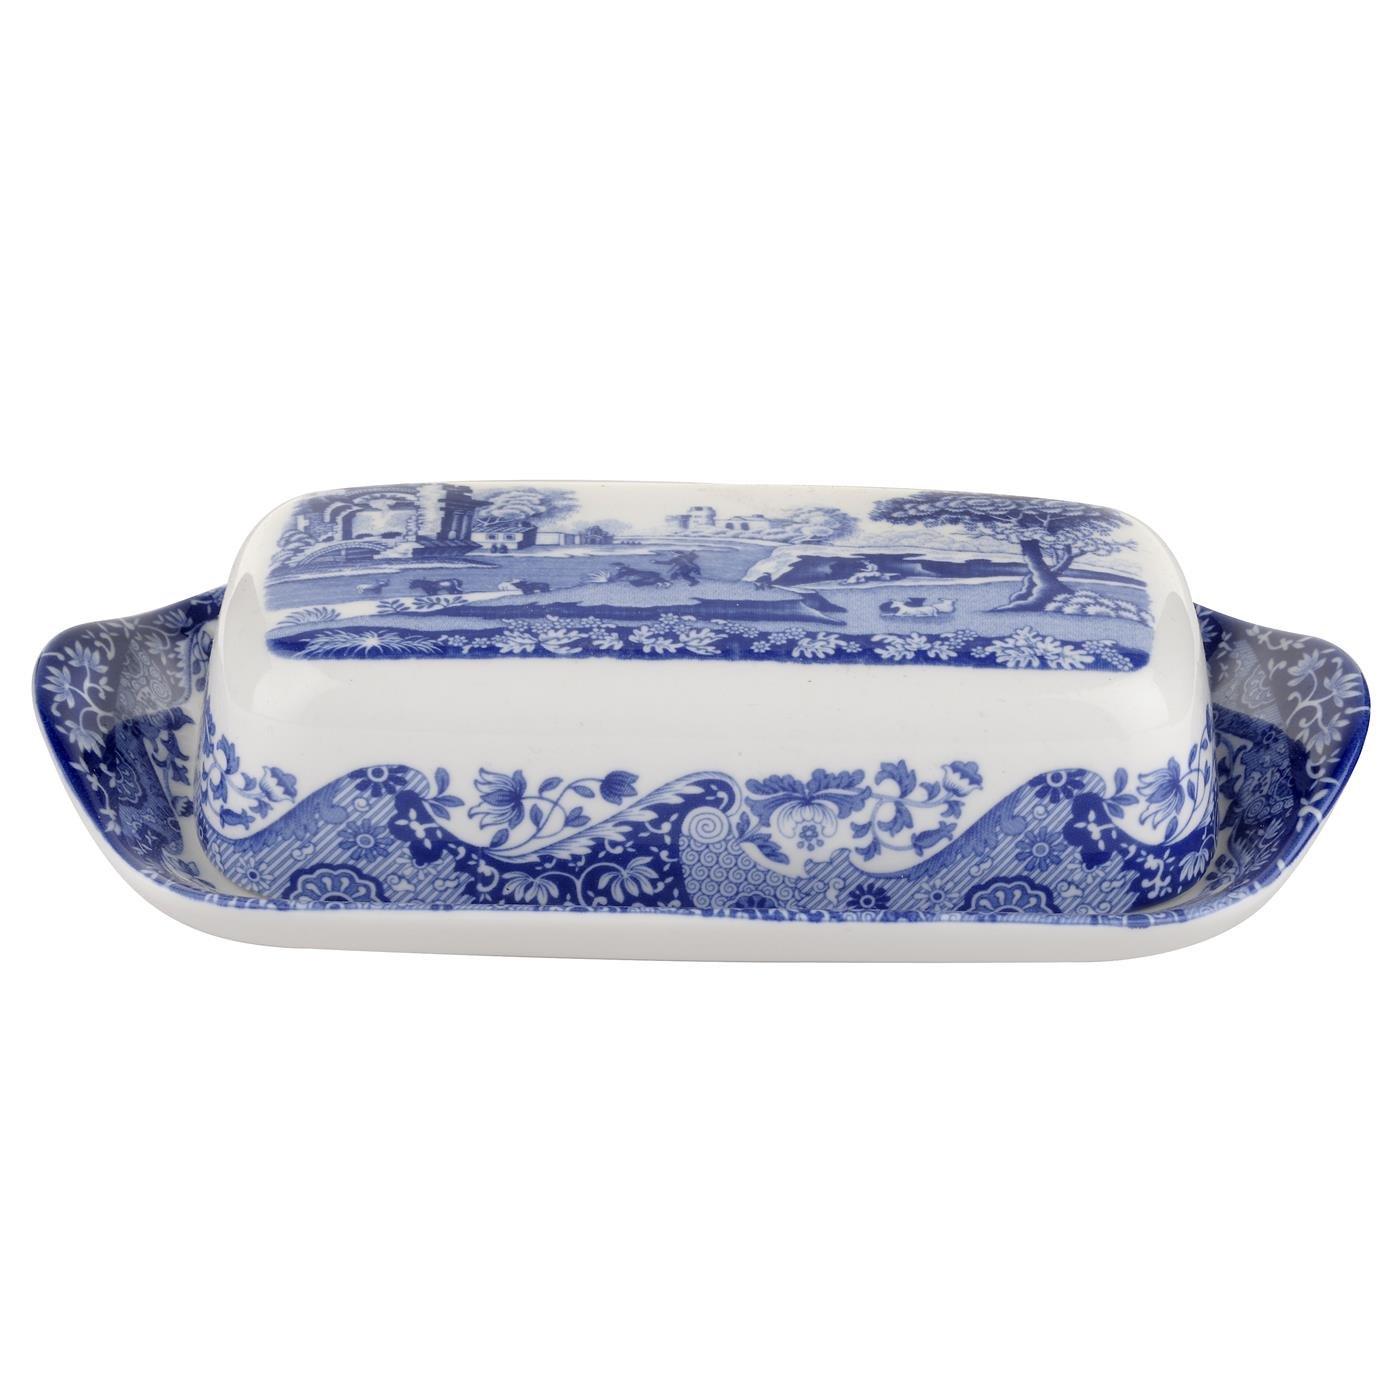 Spode Blue Italian Covered Butter Dish